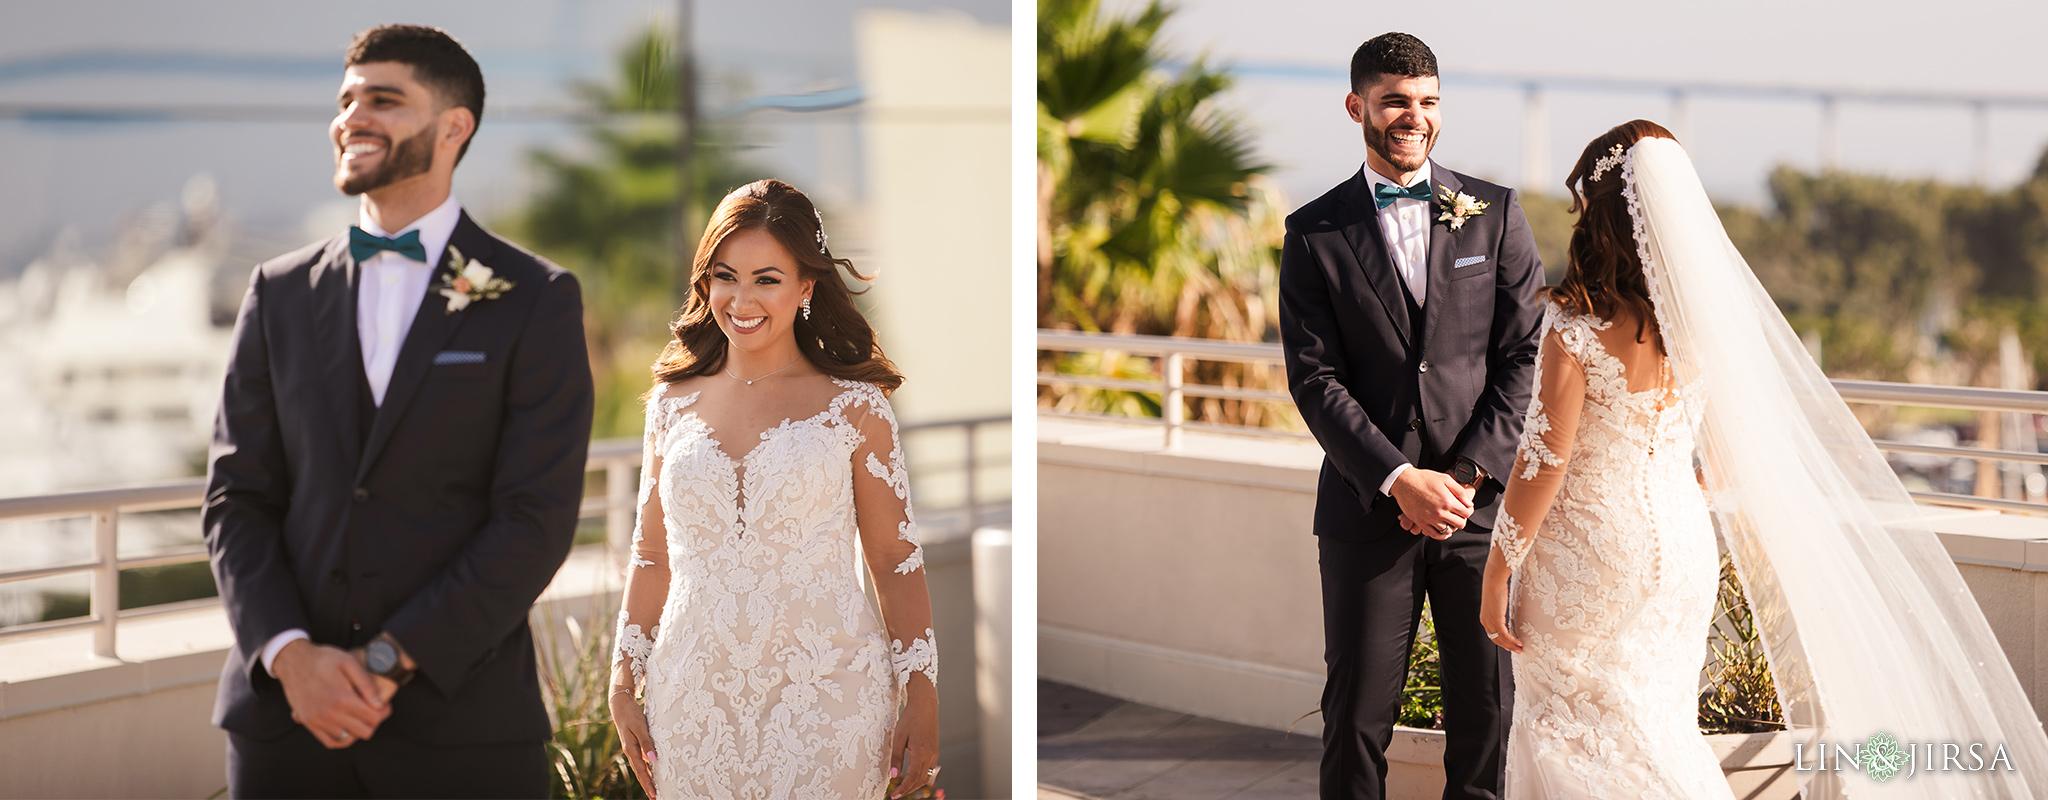 10 Marriott Hotel San Diego Wedding Photography